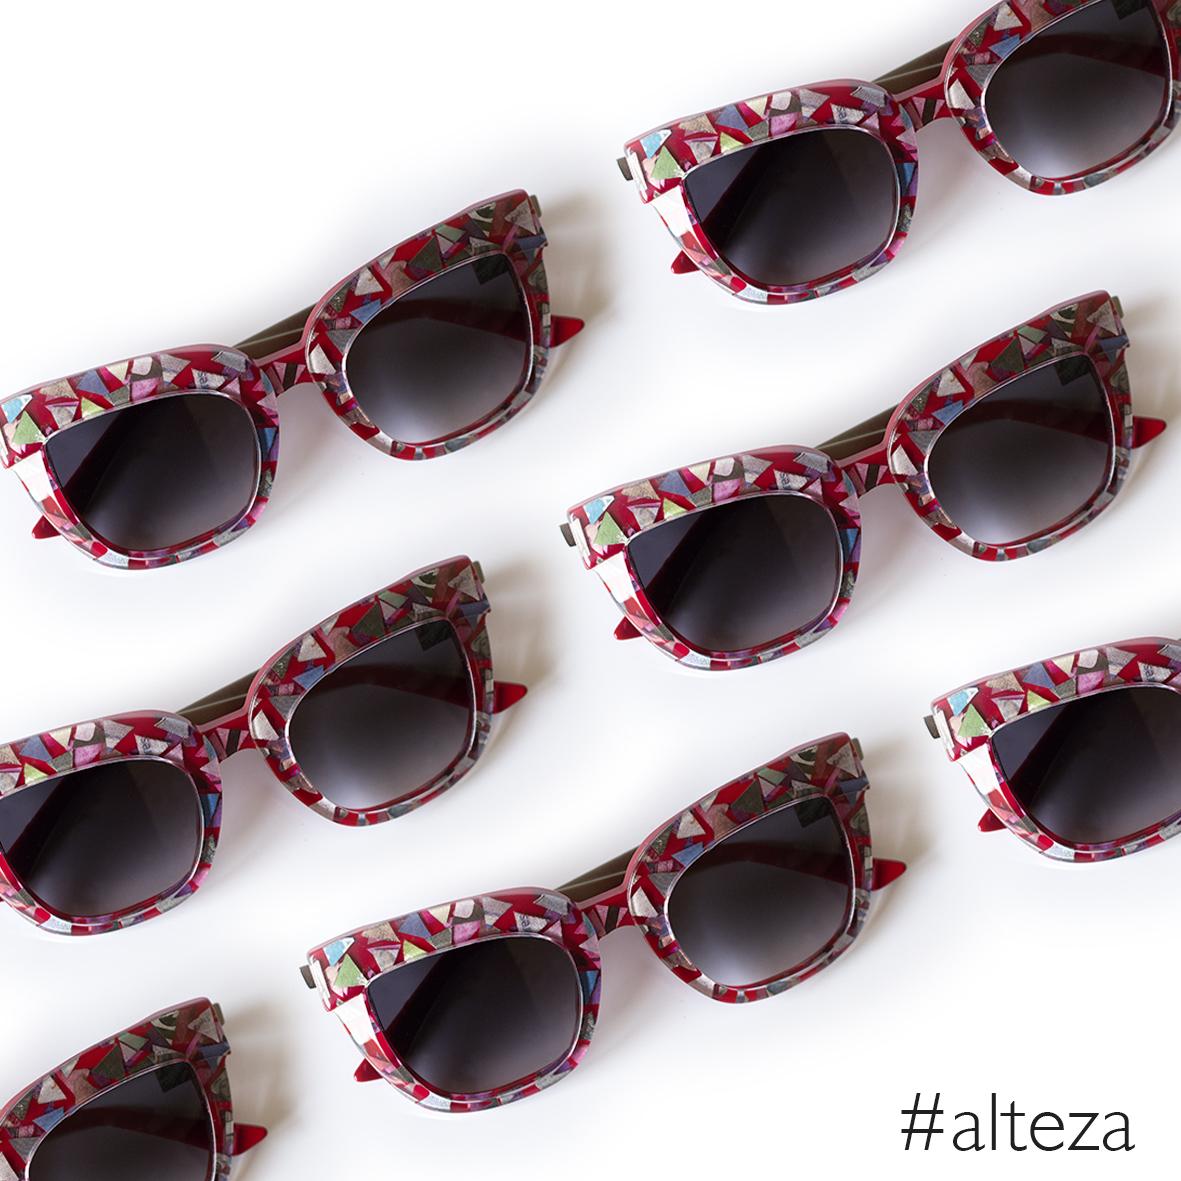 alteza-roja5